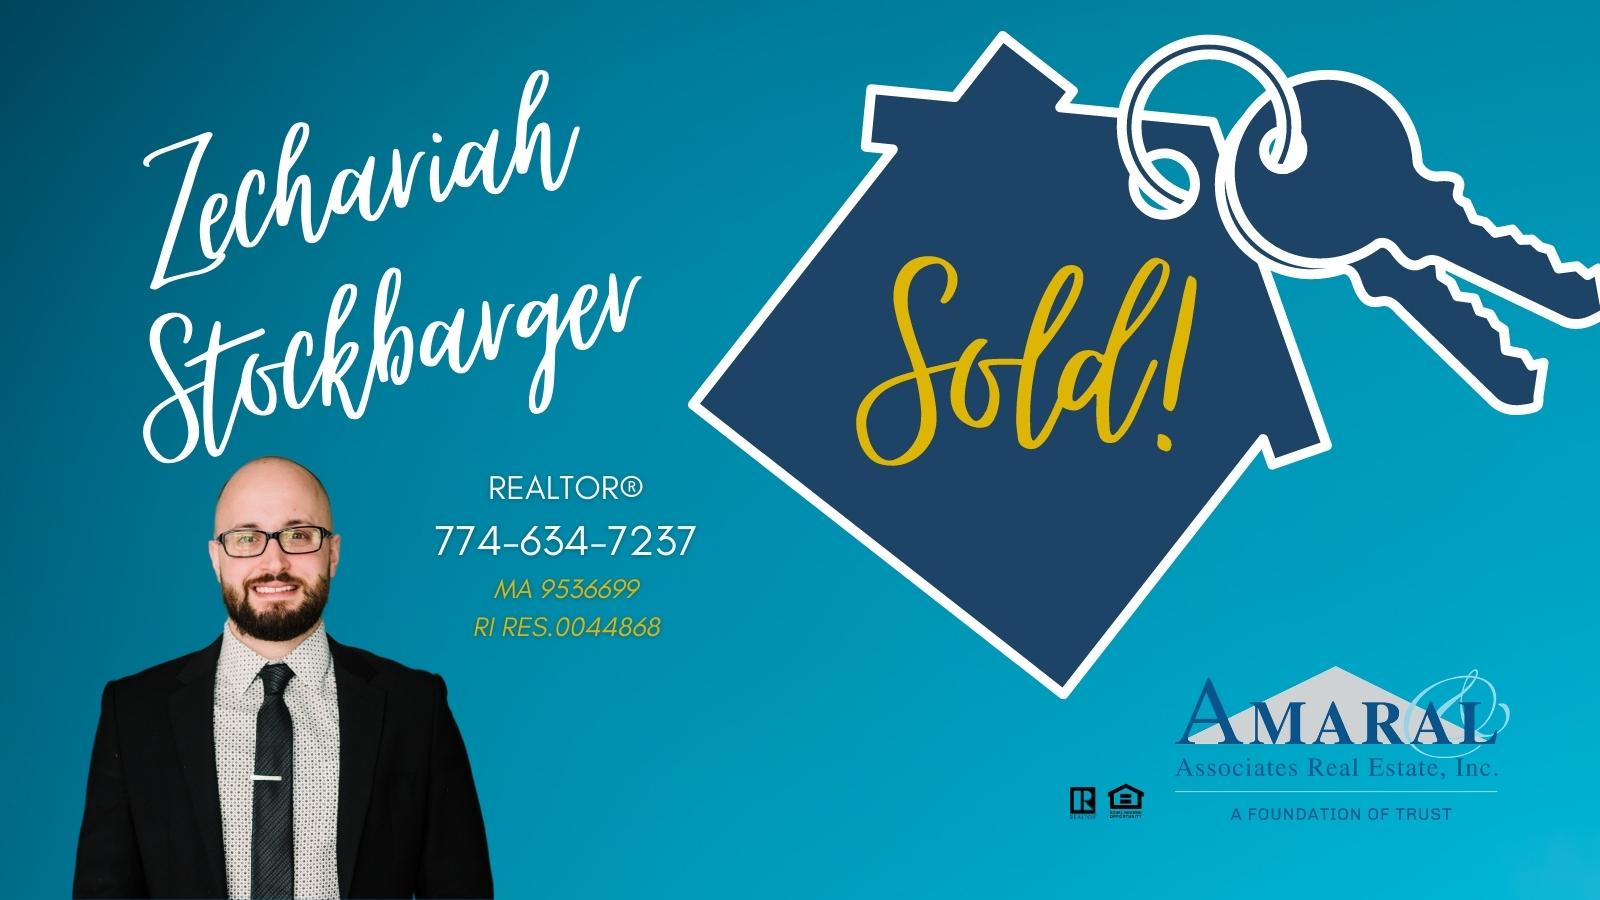 SOLD with Zechariah Stockbarger! 4 Pratt Ave, Westport, MA